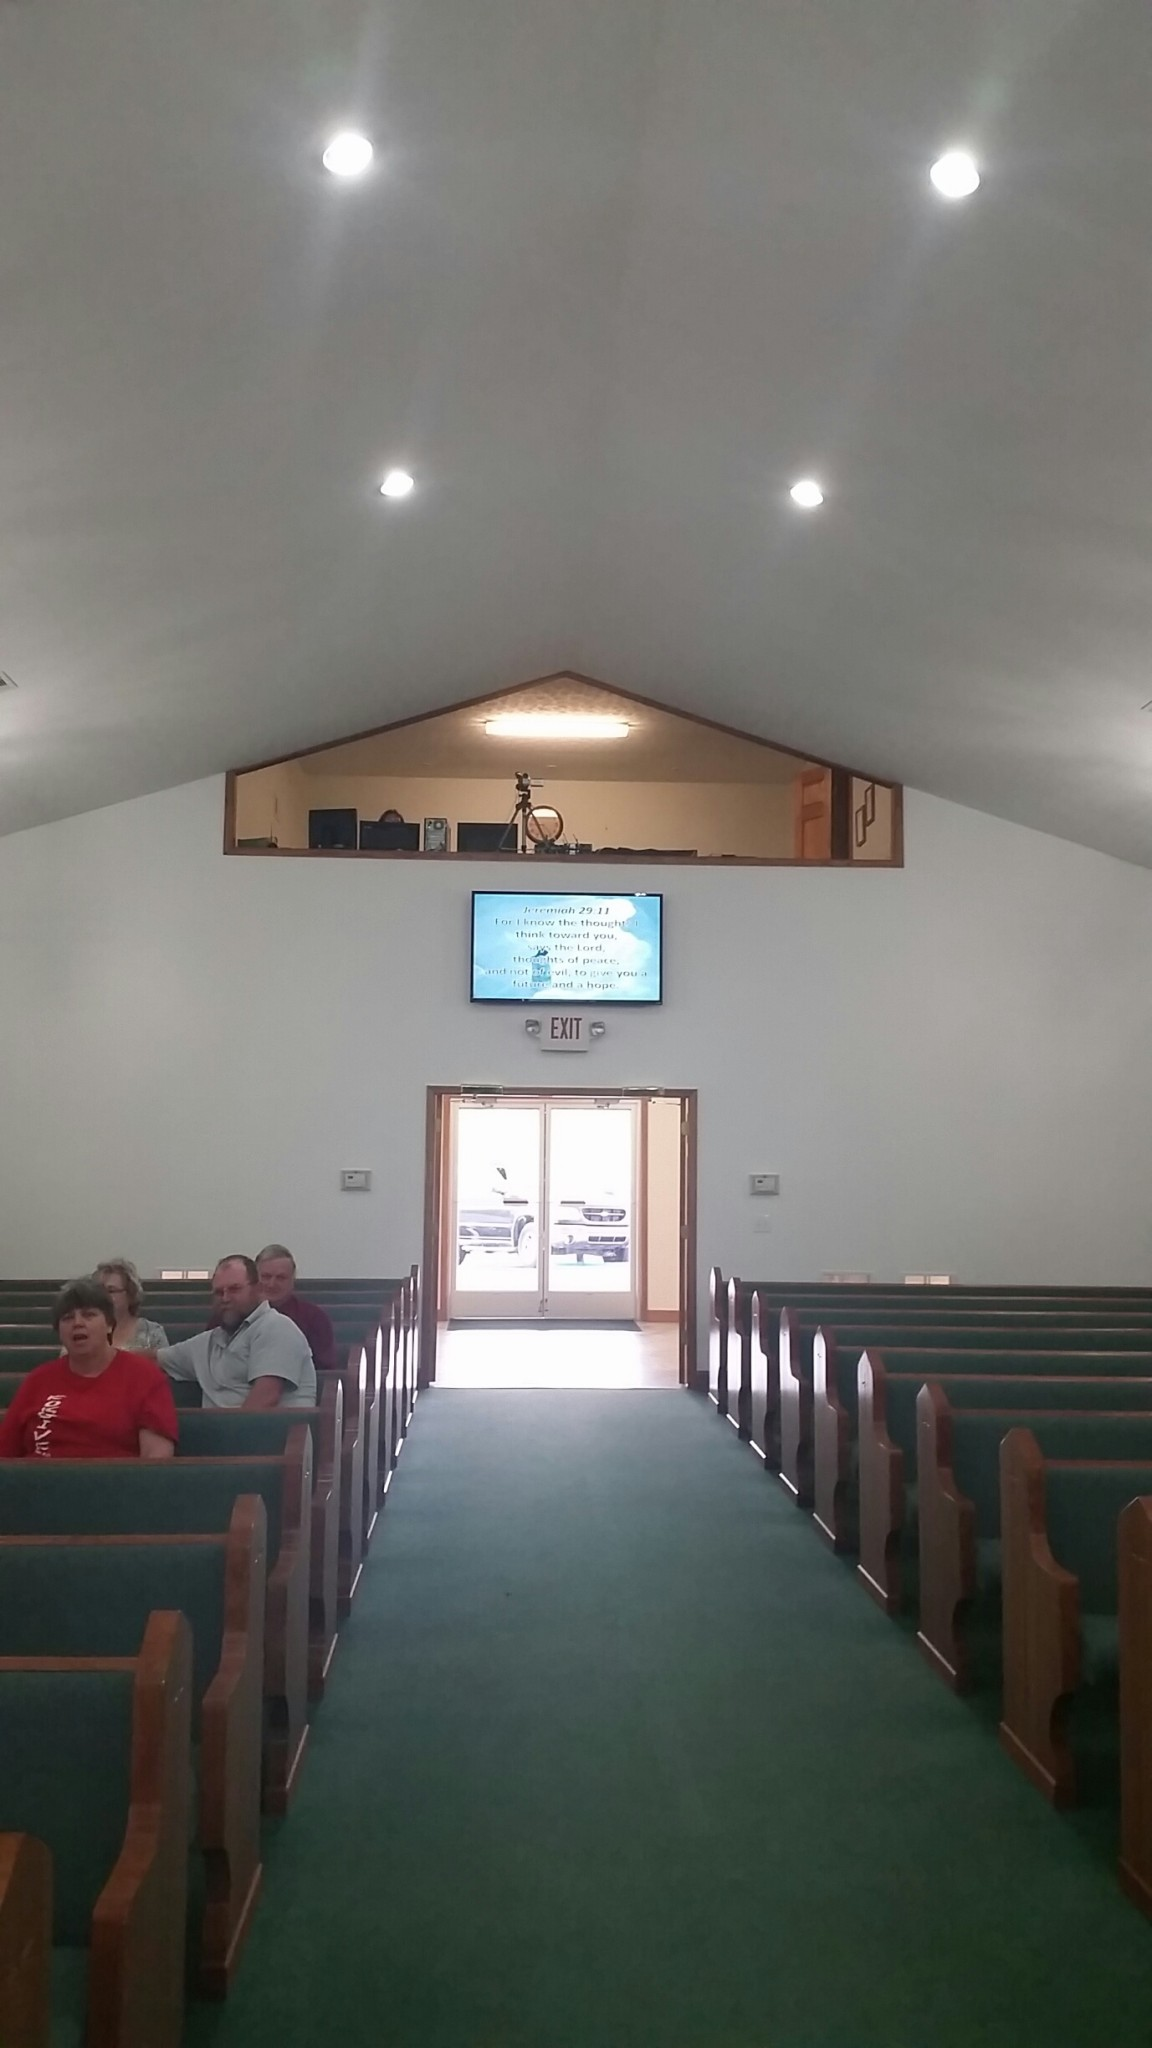 Hurricane Chapel Freewill Baptist - McEwen, TN